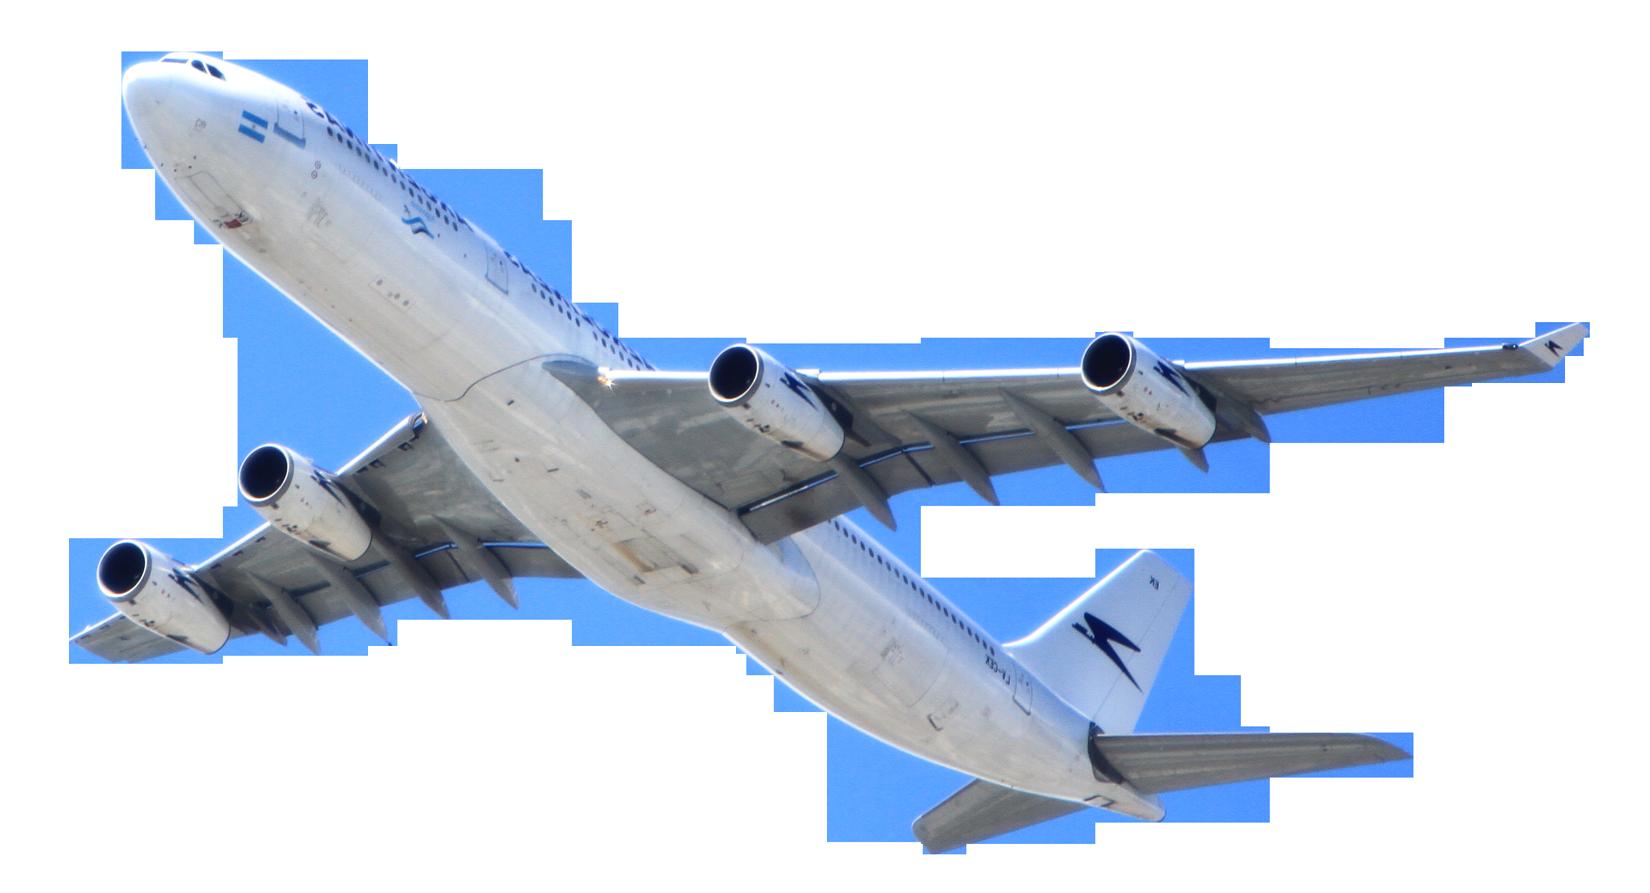 Passenger Airplane PNG Image.